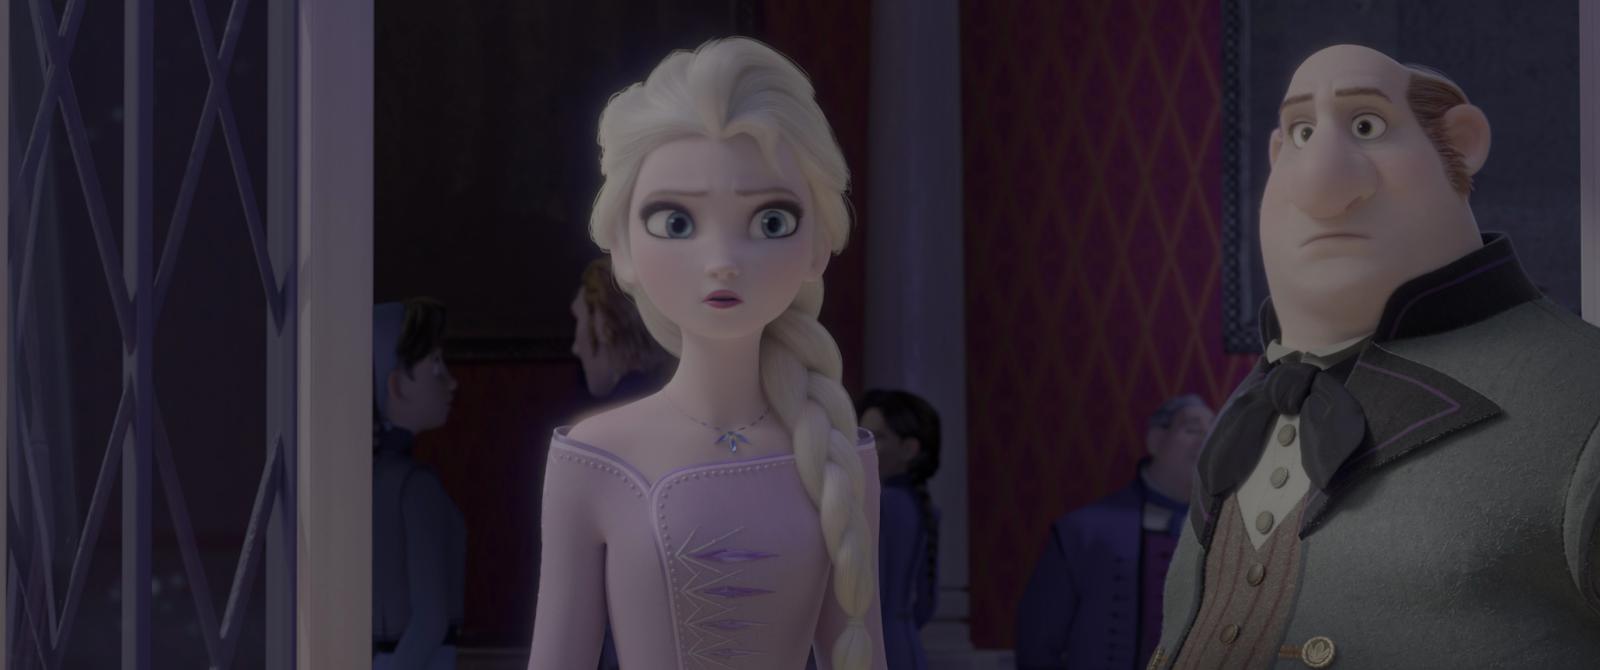 Frozen 2 (2019) 4K UHD HDR Latino